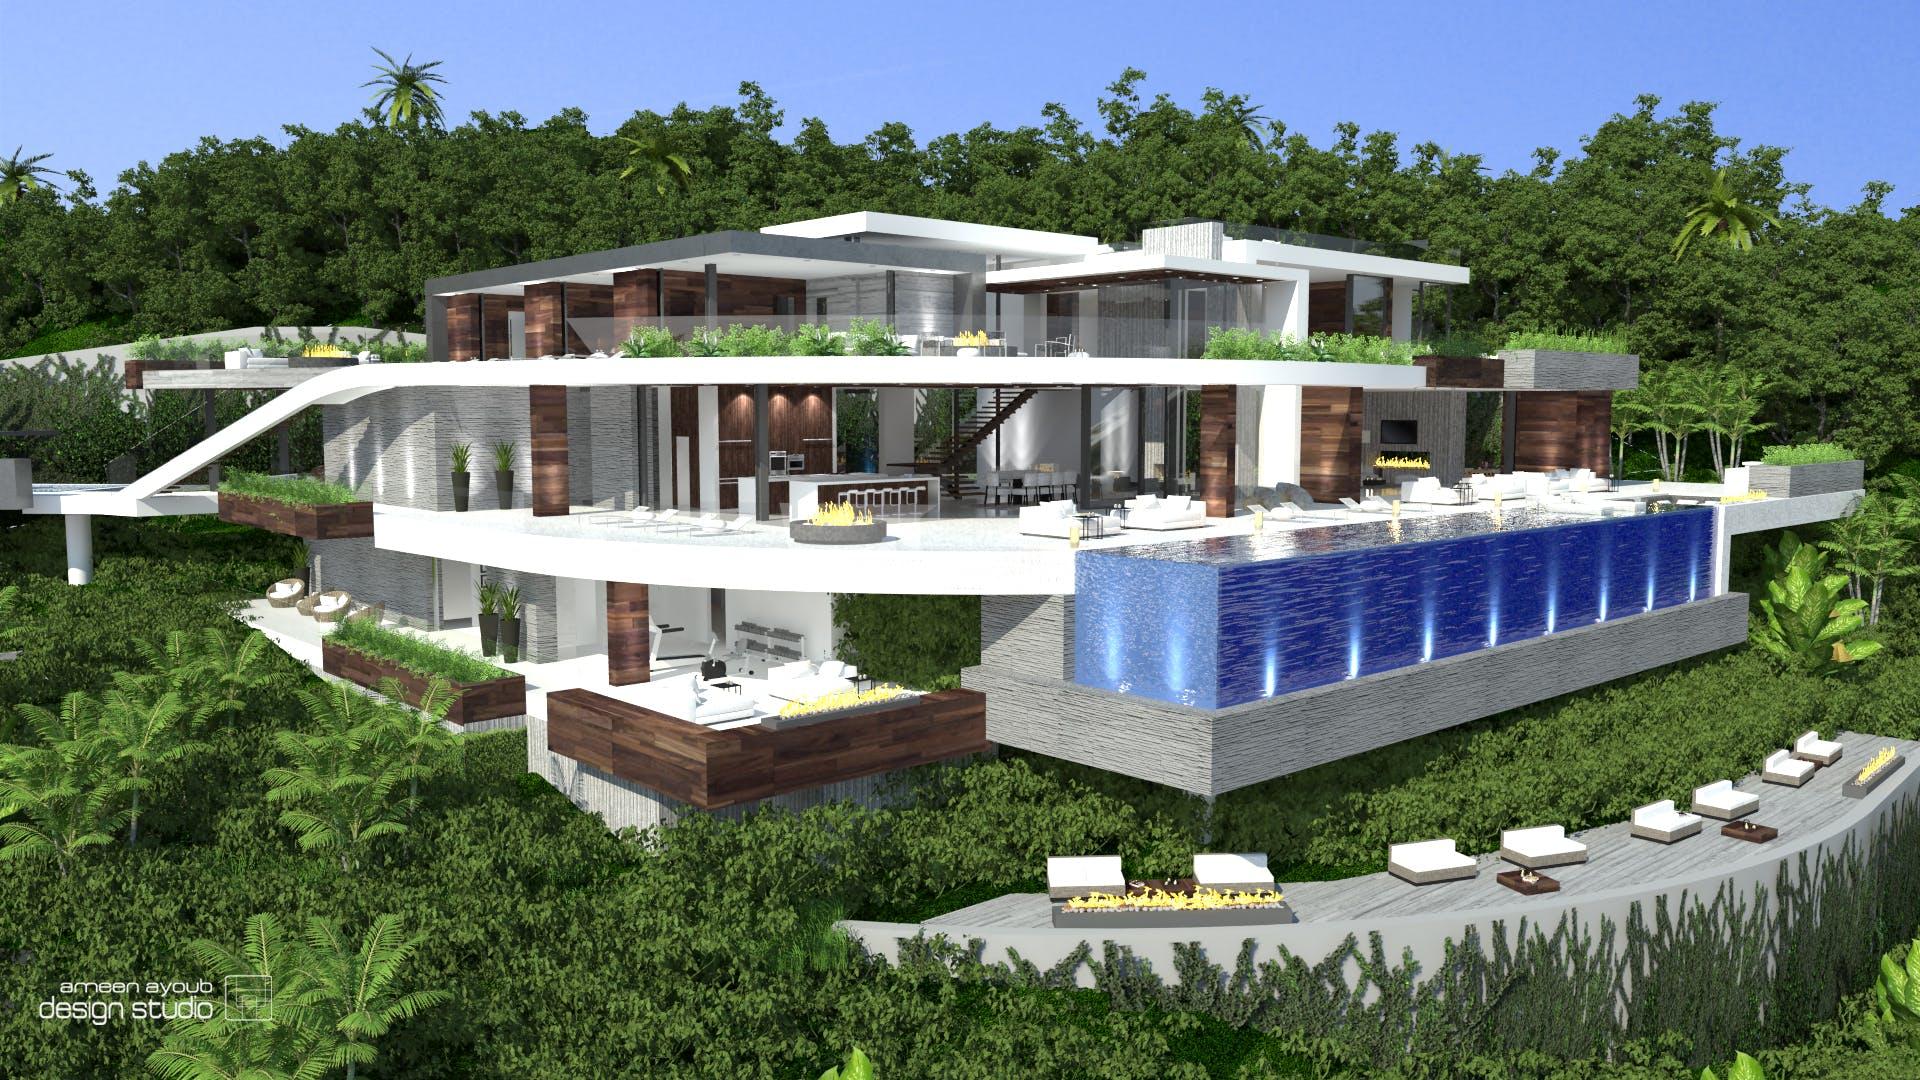 1300 Beverly Estates Residence Ameen Ayoub Archinect